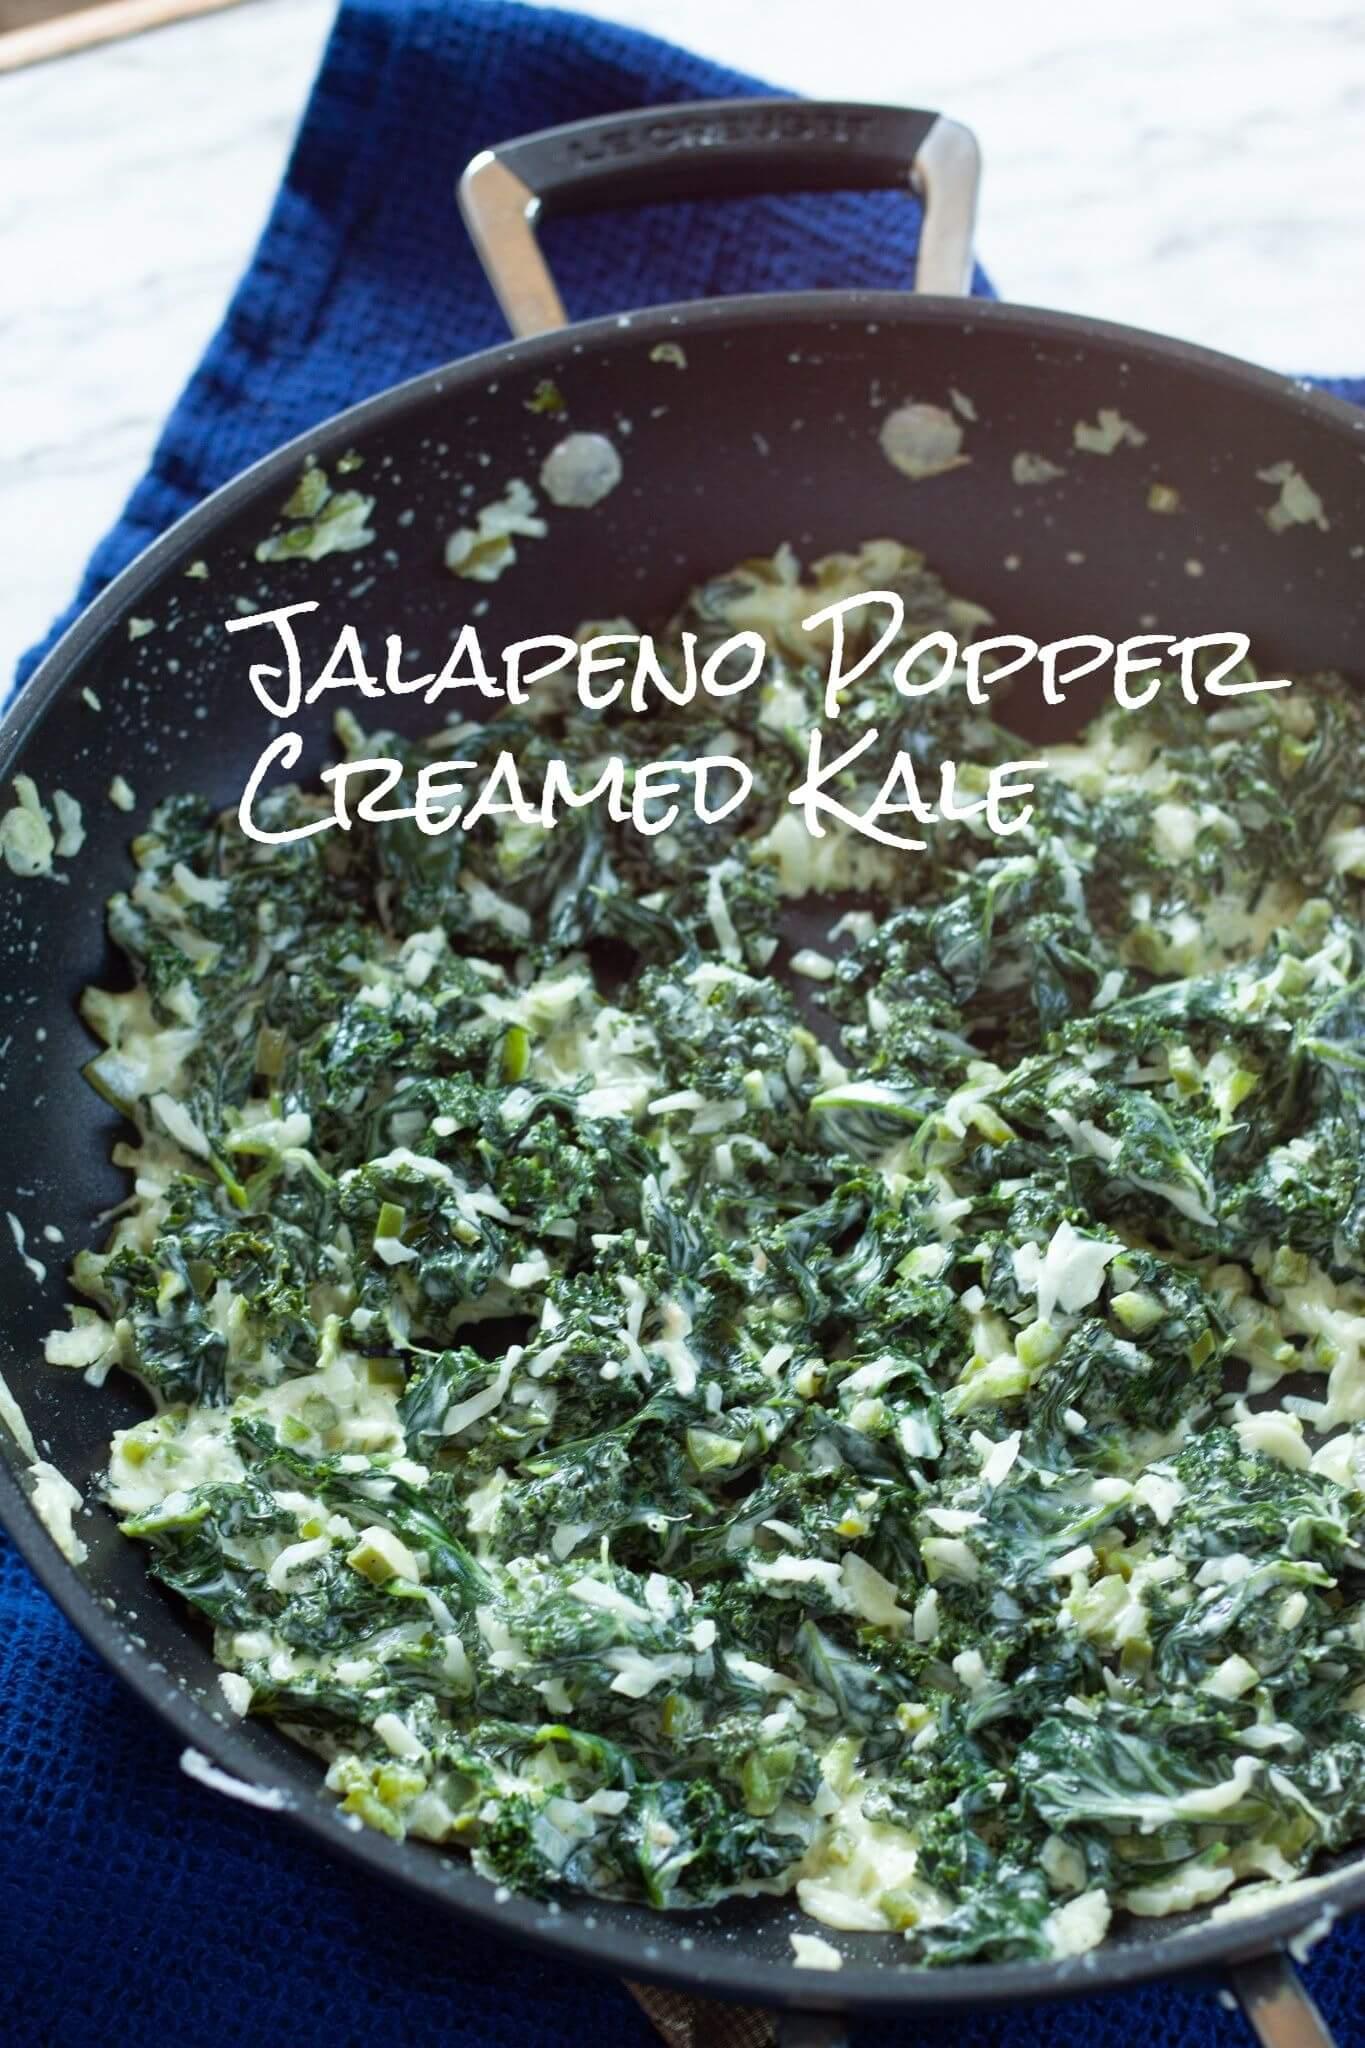 Jalapeno Popper Creamed Kale